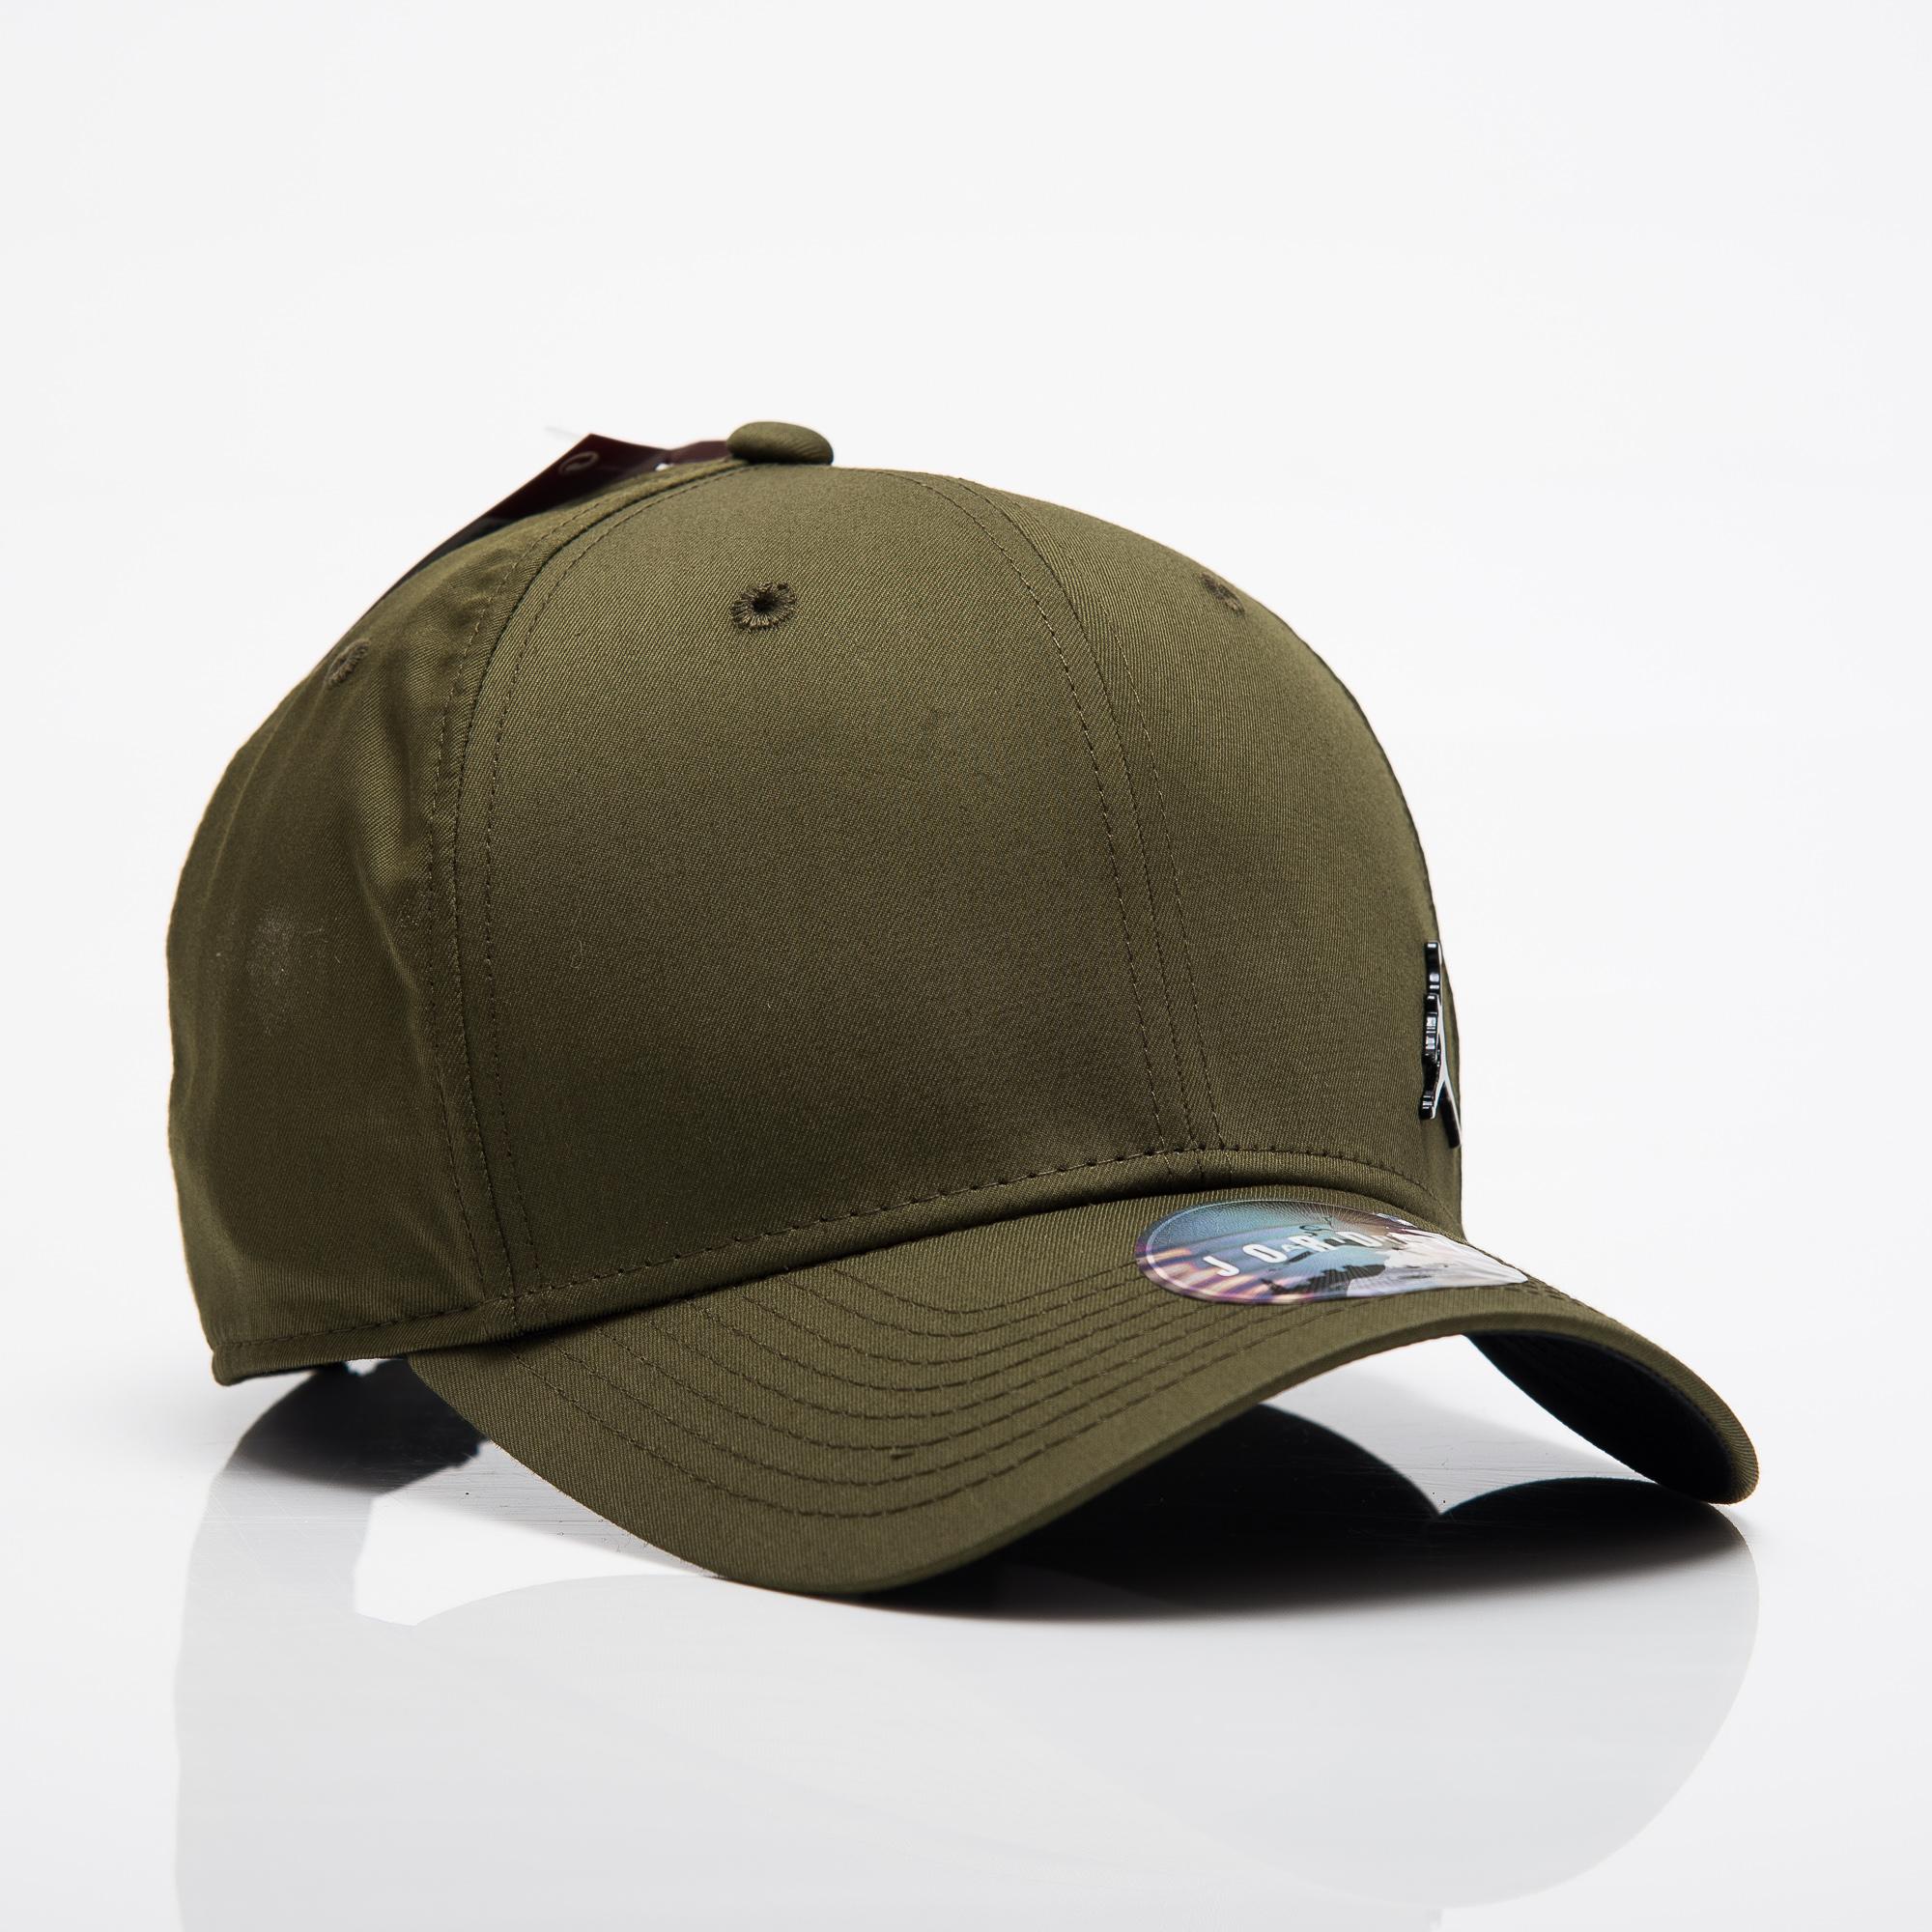 45e8856f011 Jordan Metal Jumpman Cap - Caps Baseball Caps - Sporting goods